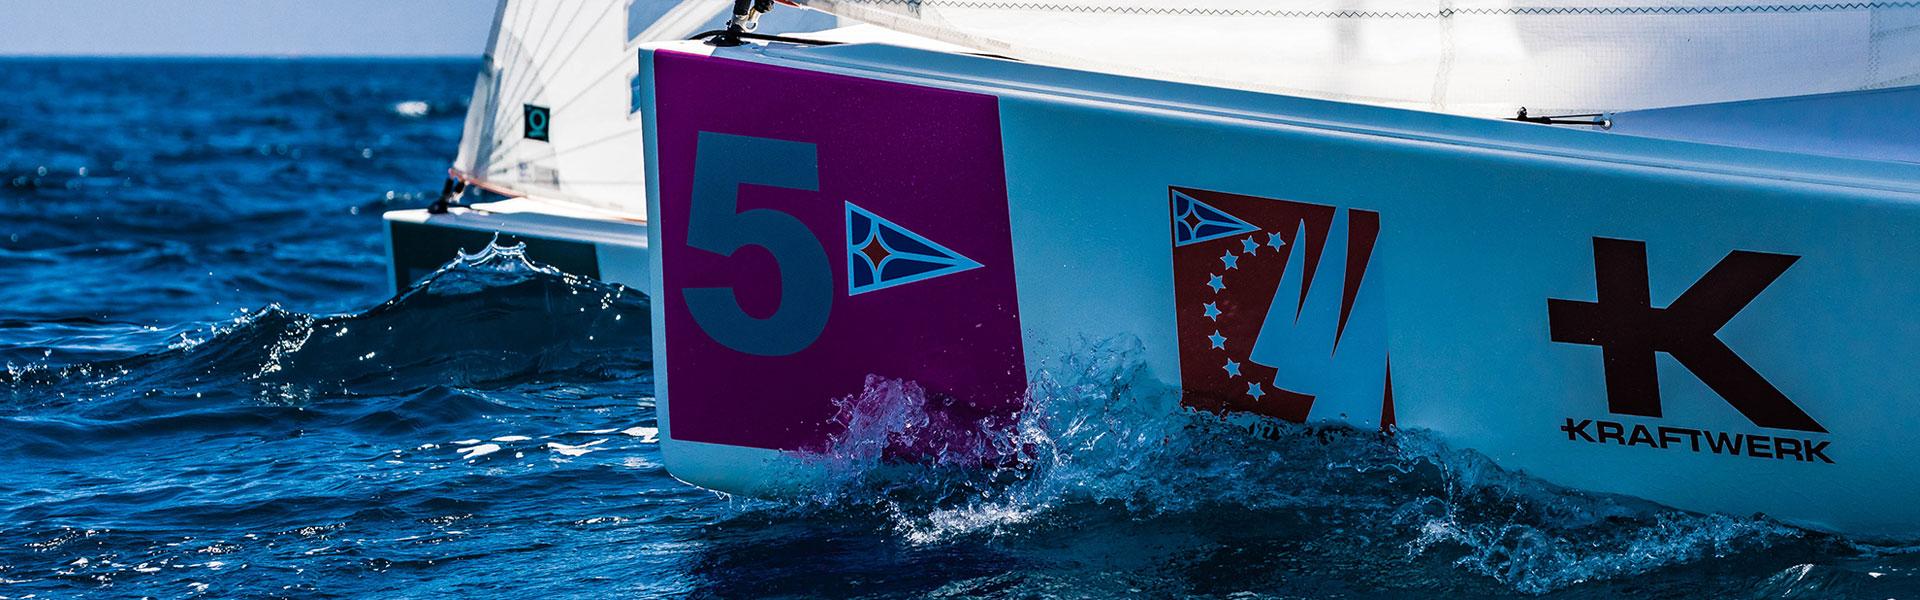 One Ocean - Sailing Champions League - Porto Cervo 2019